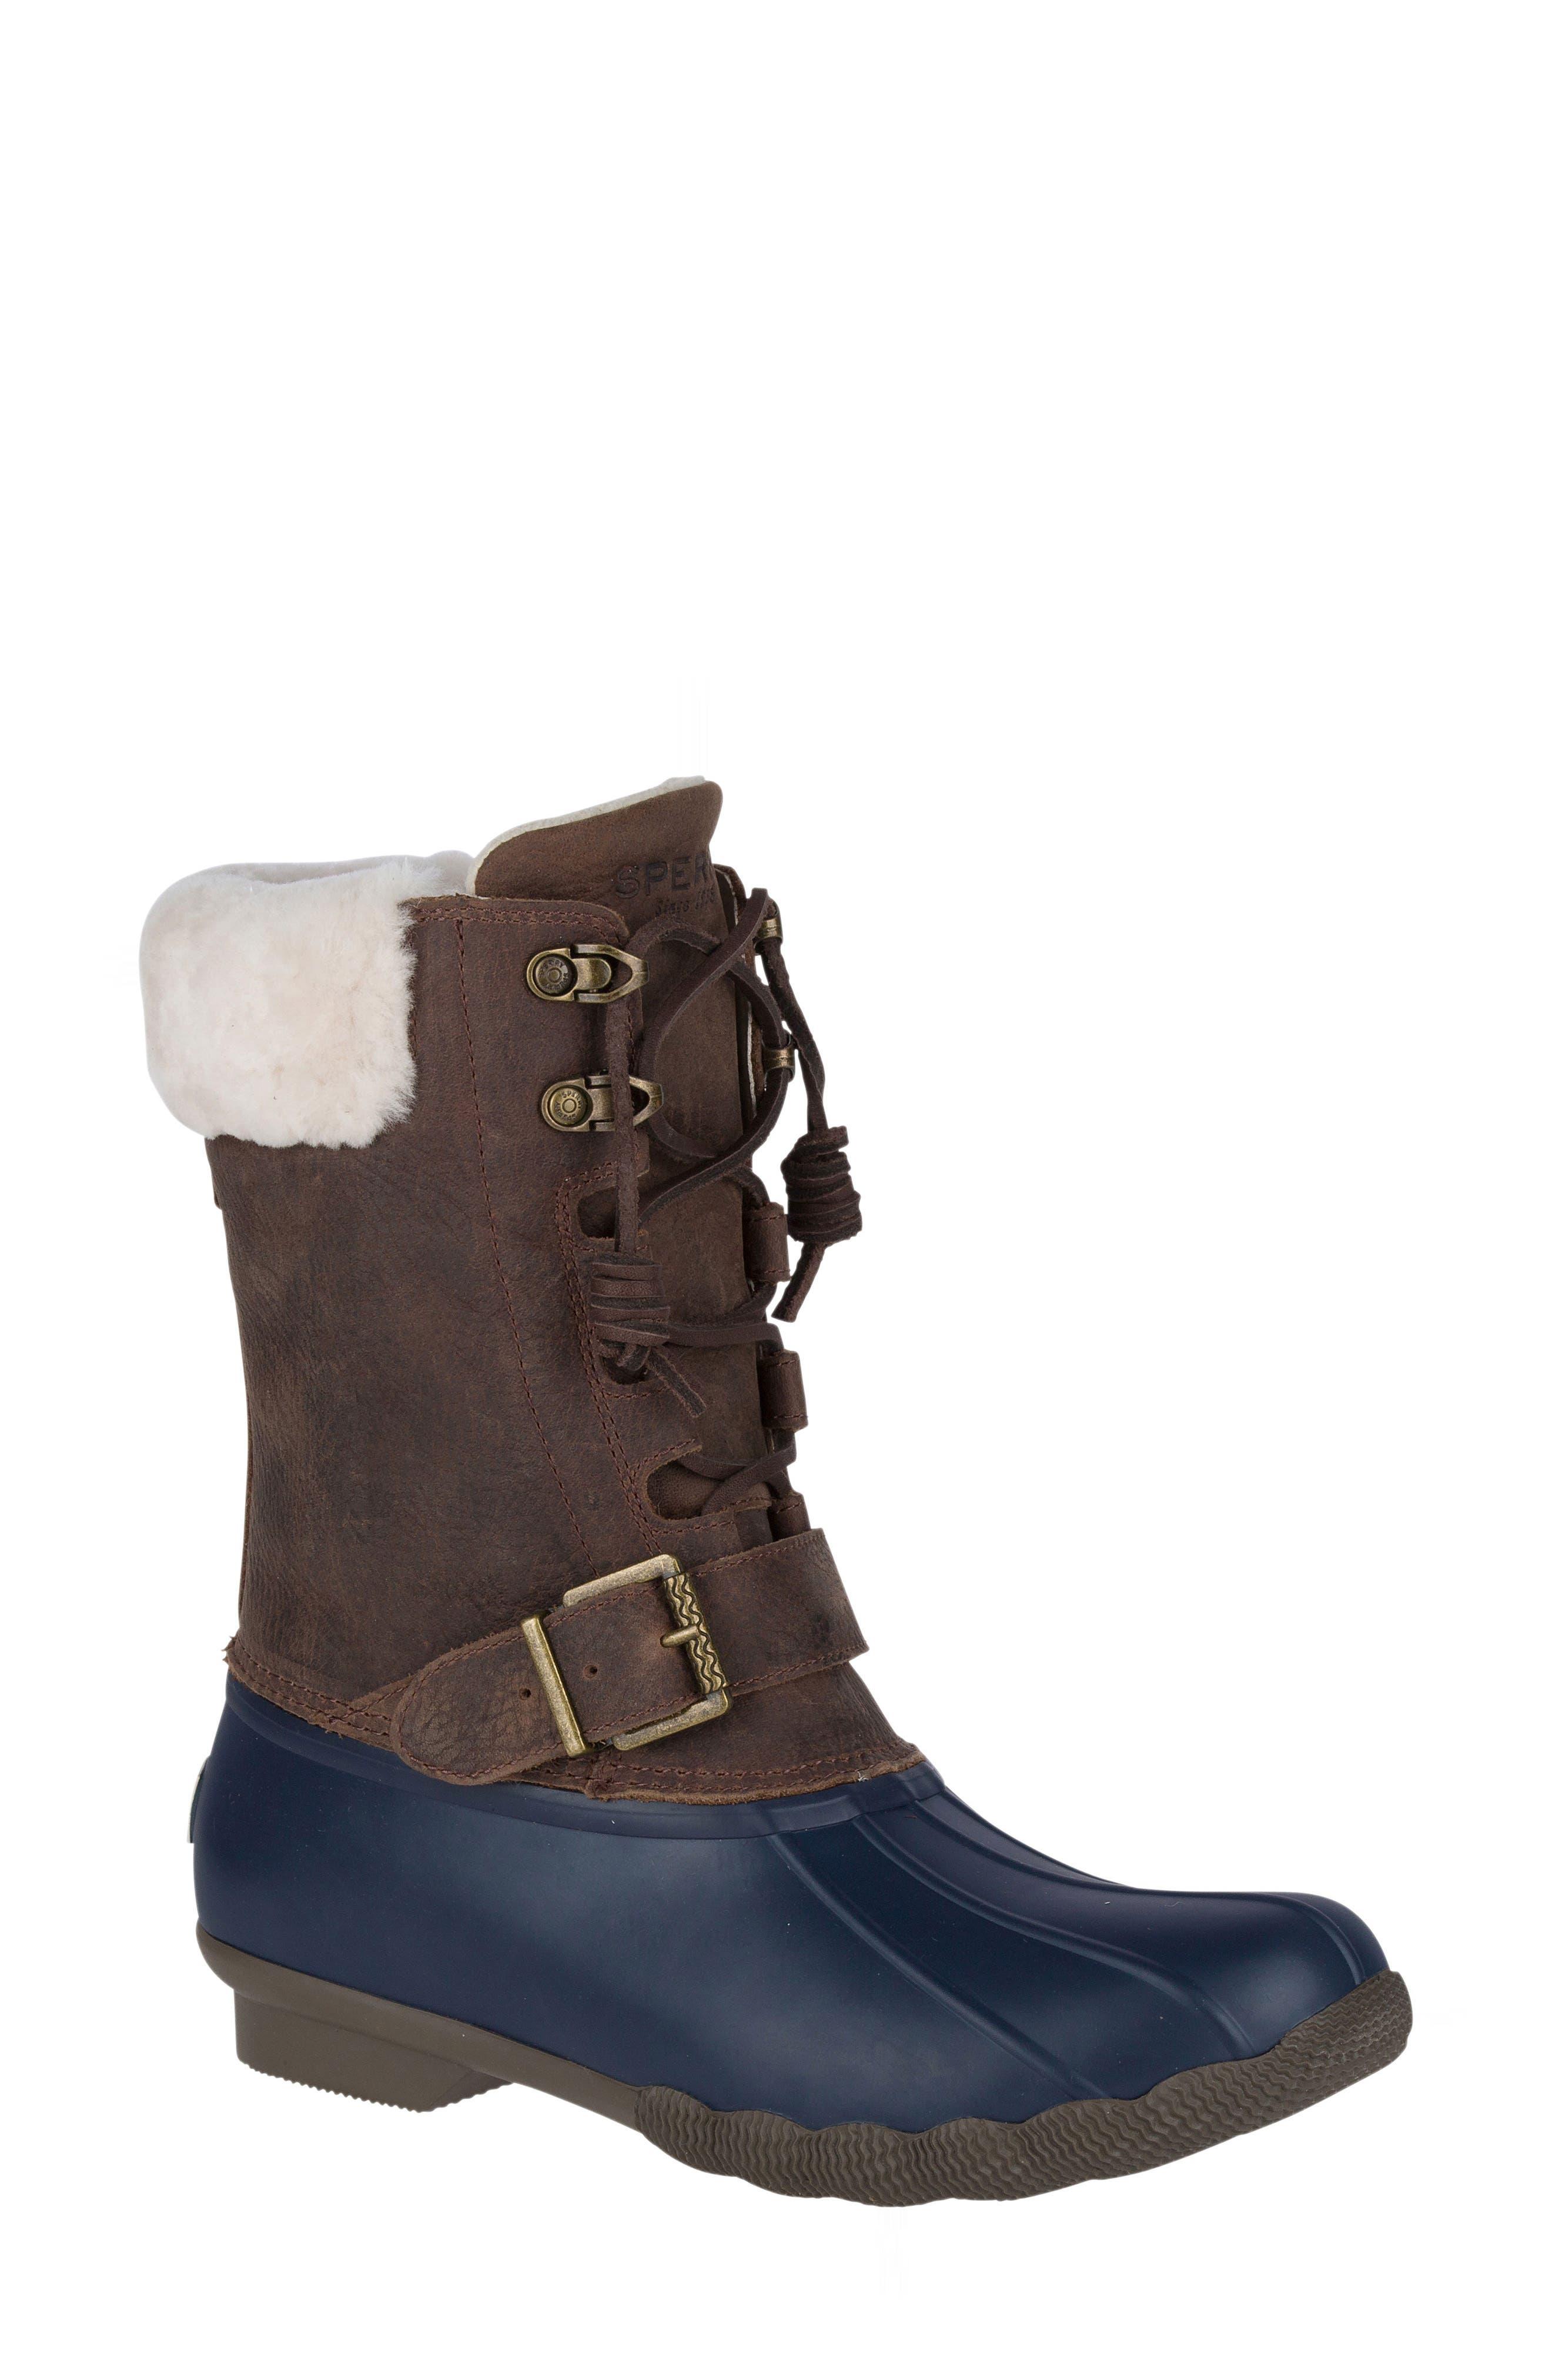 Main Image - Sperry Saltwater Misty Waterproof Rain Boot (Women)